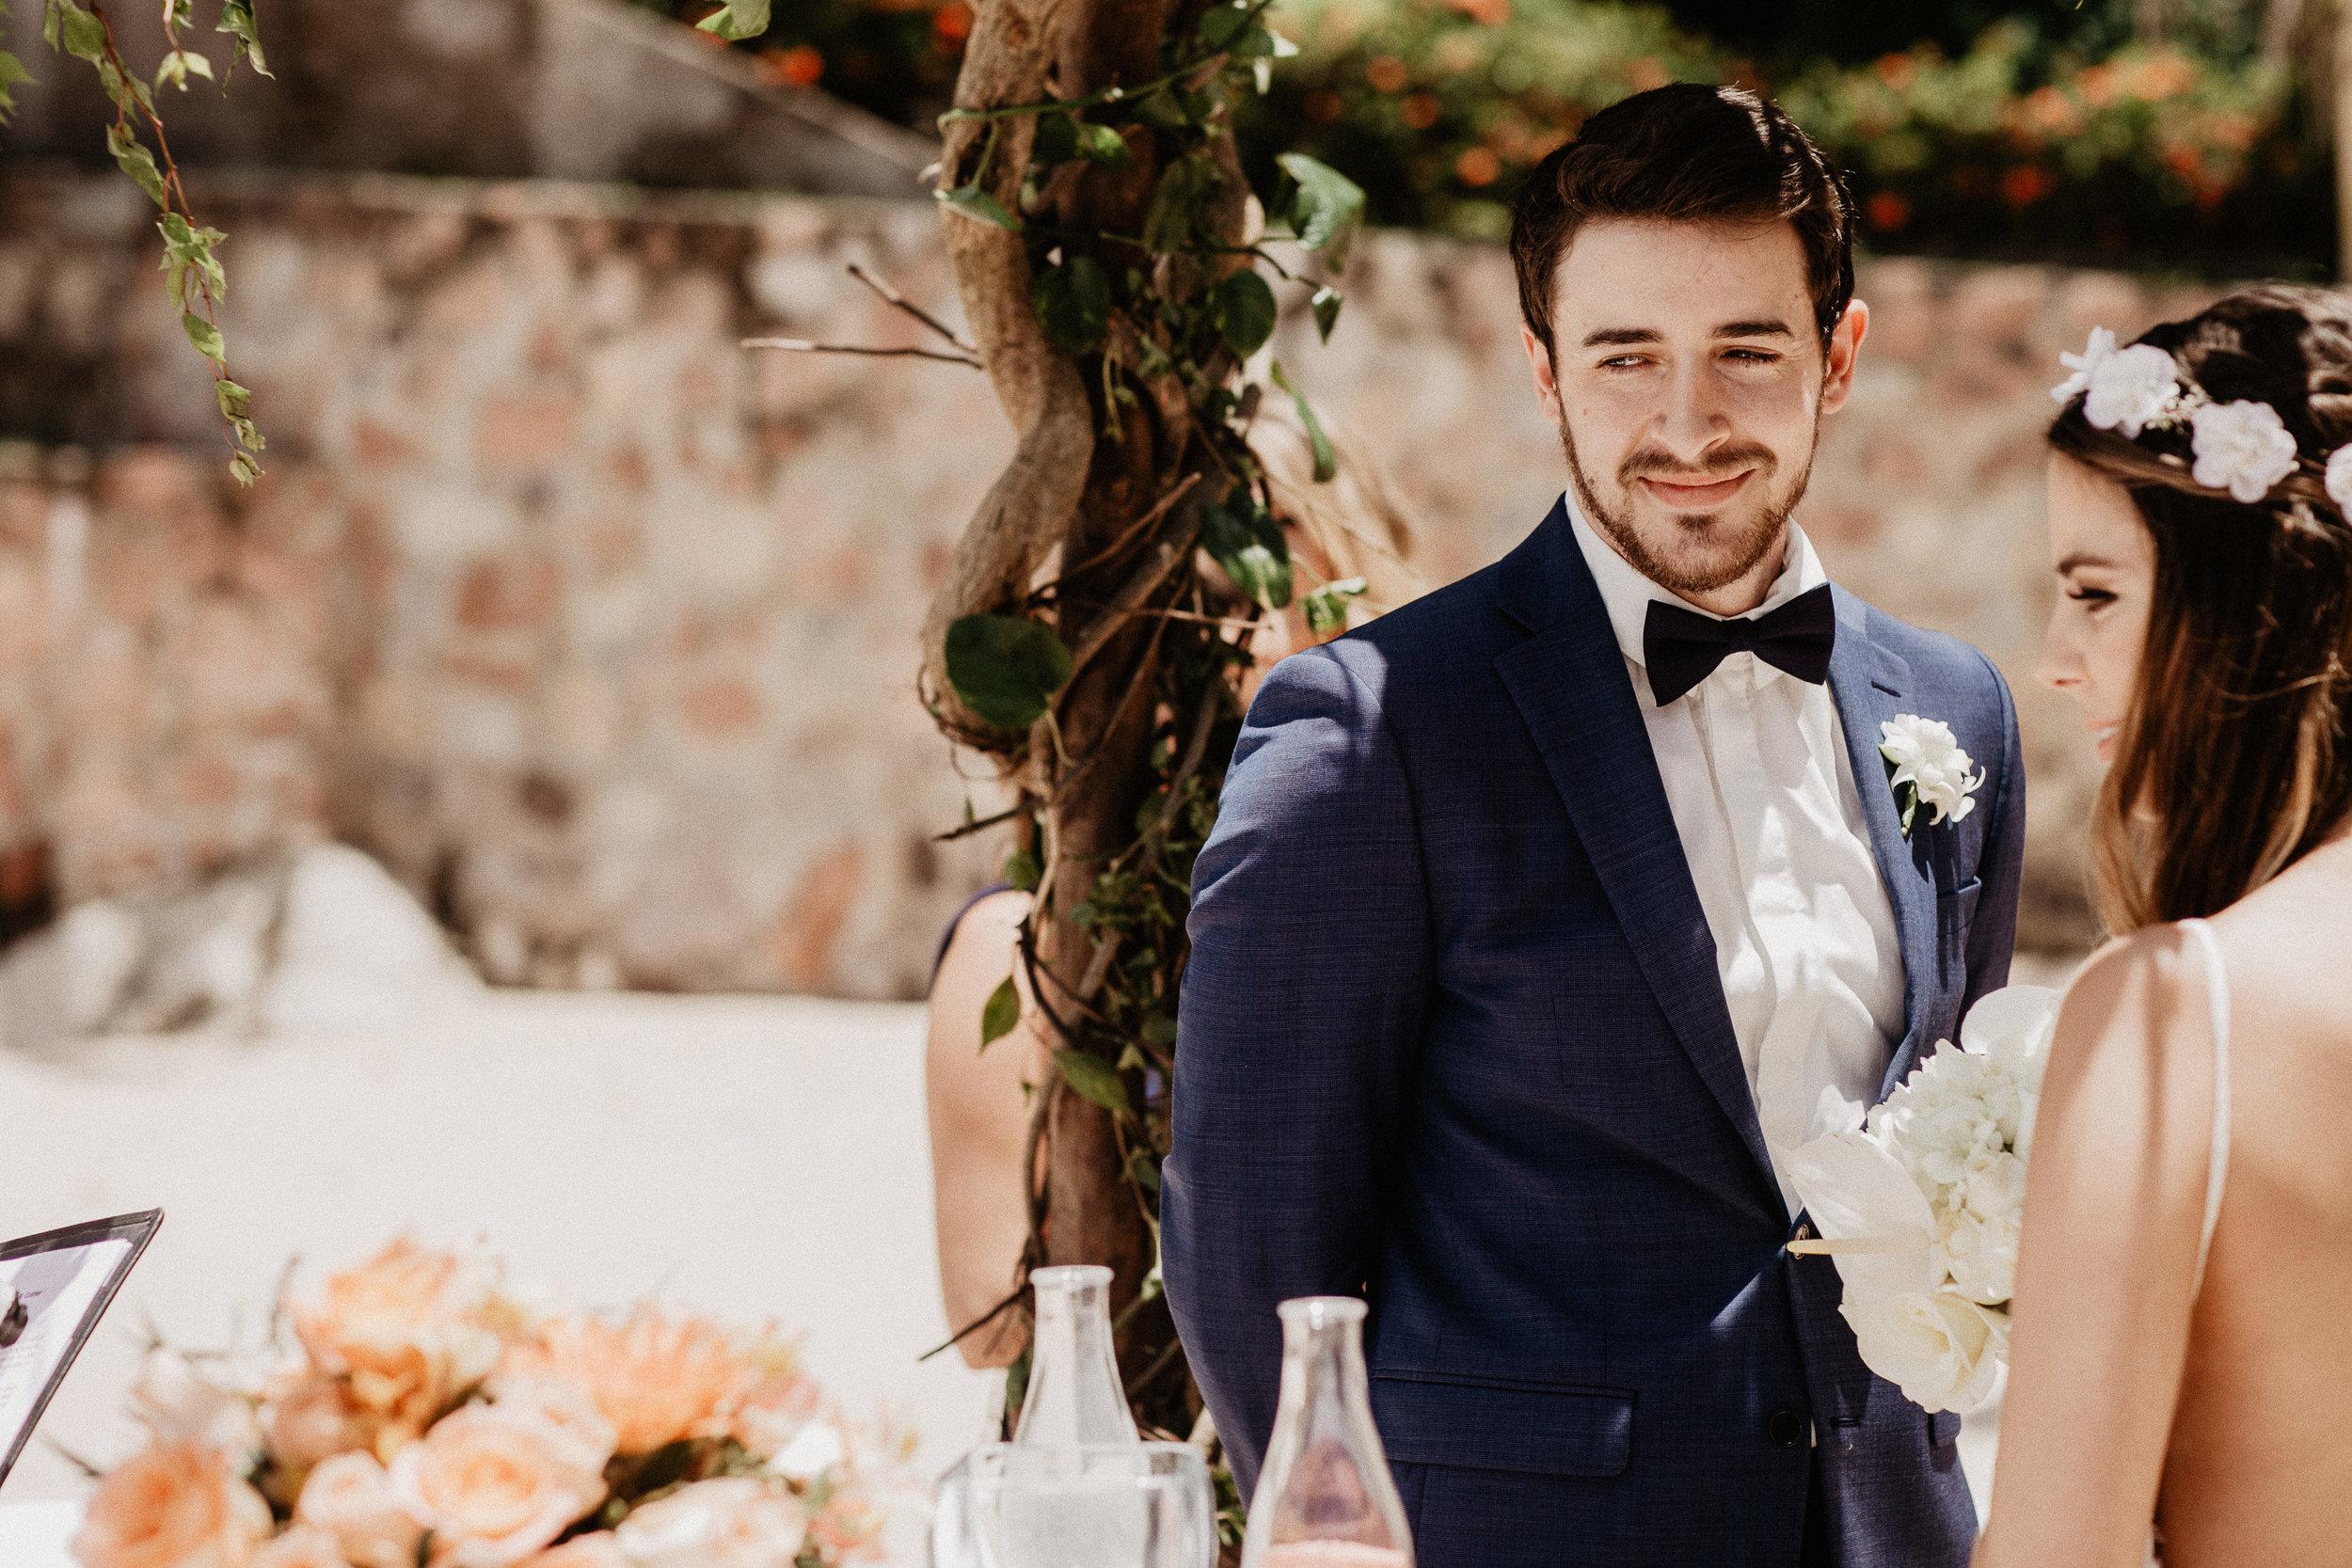 alfonso_flores_destination_wedding_photography_puerto_vallarta_hotel_barcelo_vallarta_cuttler_amela-216.JPG